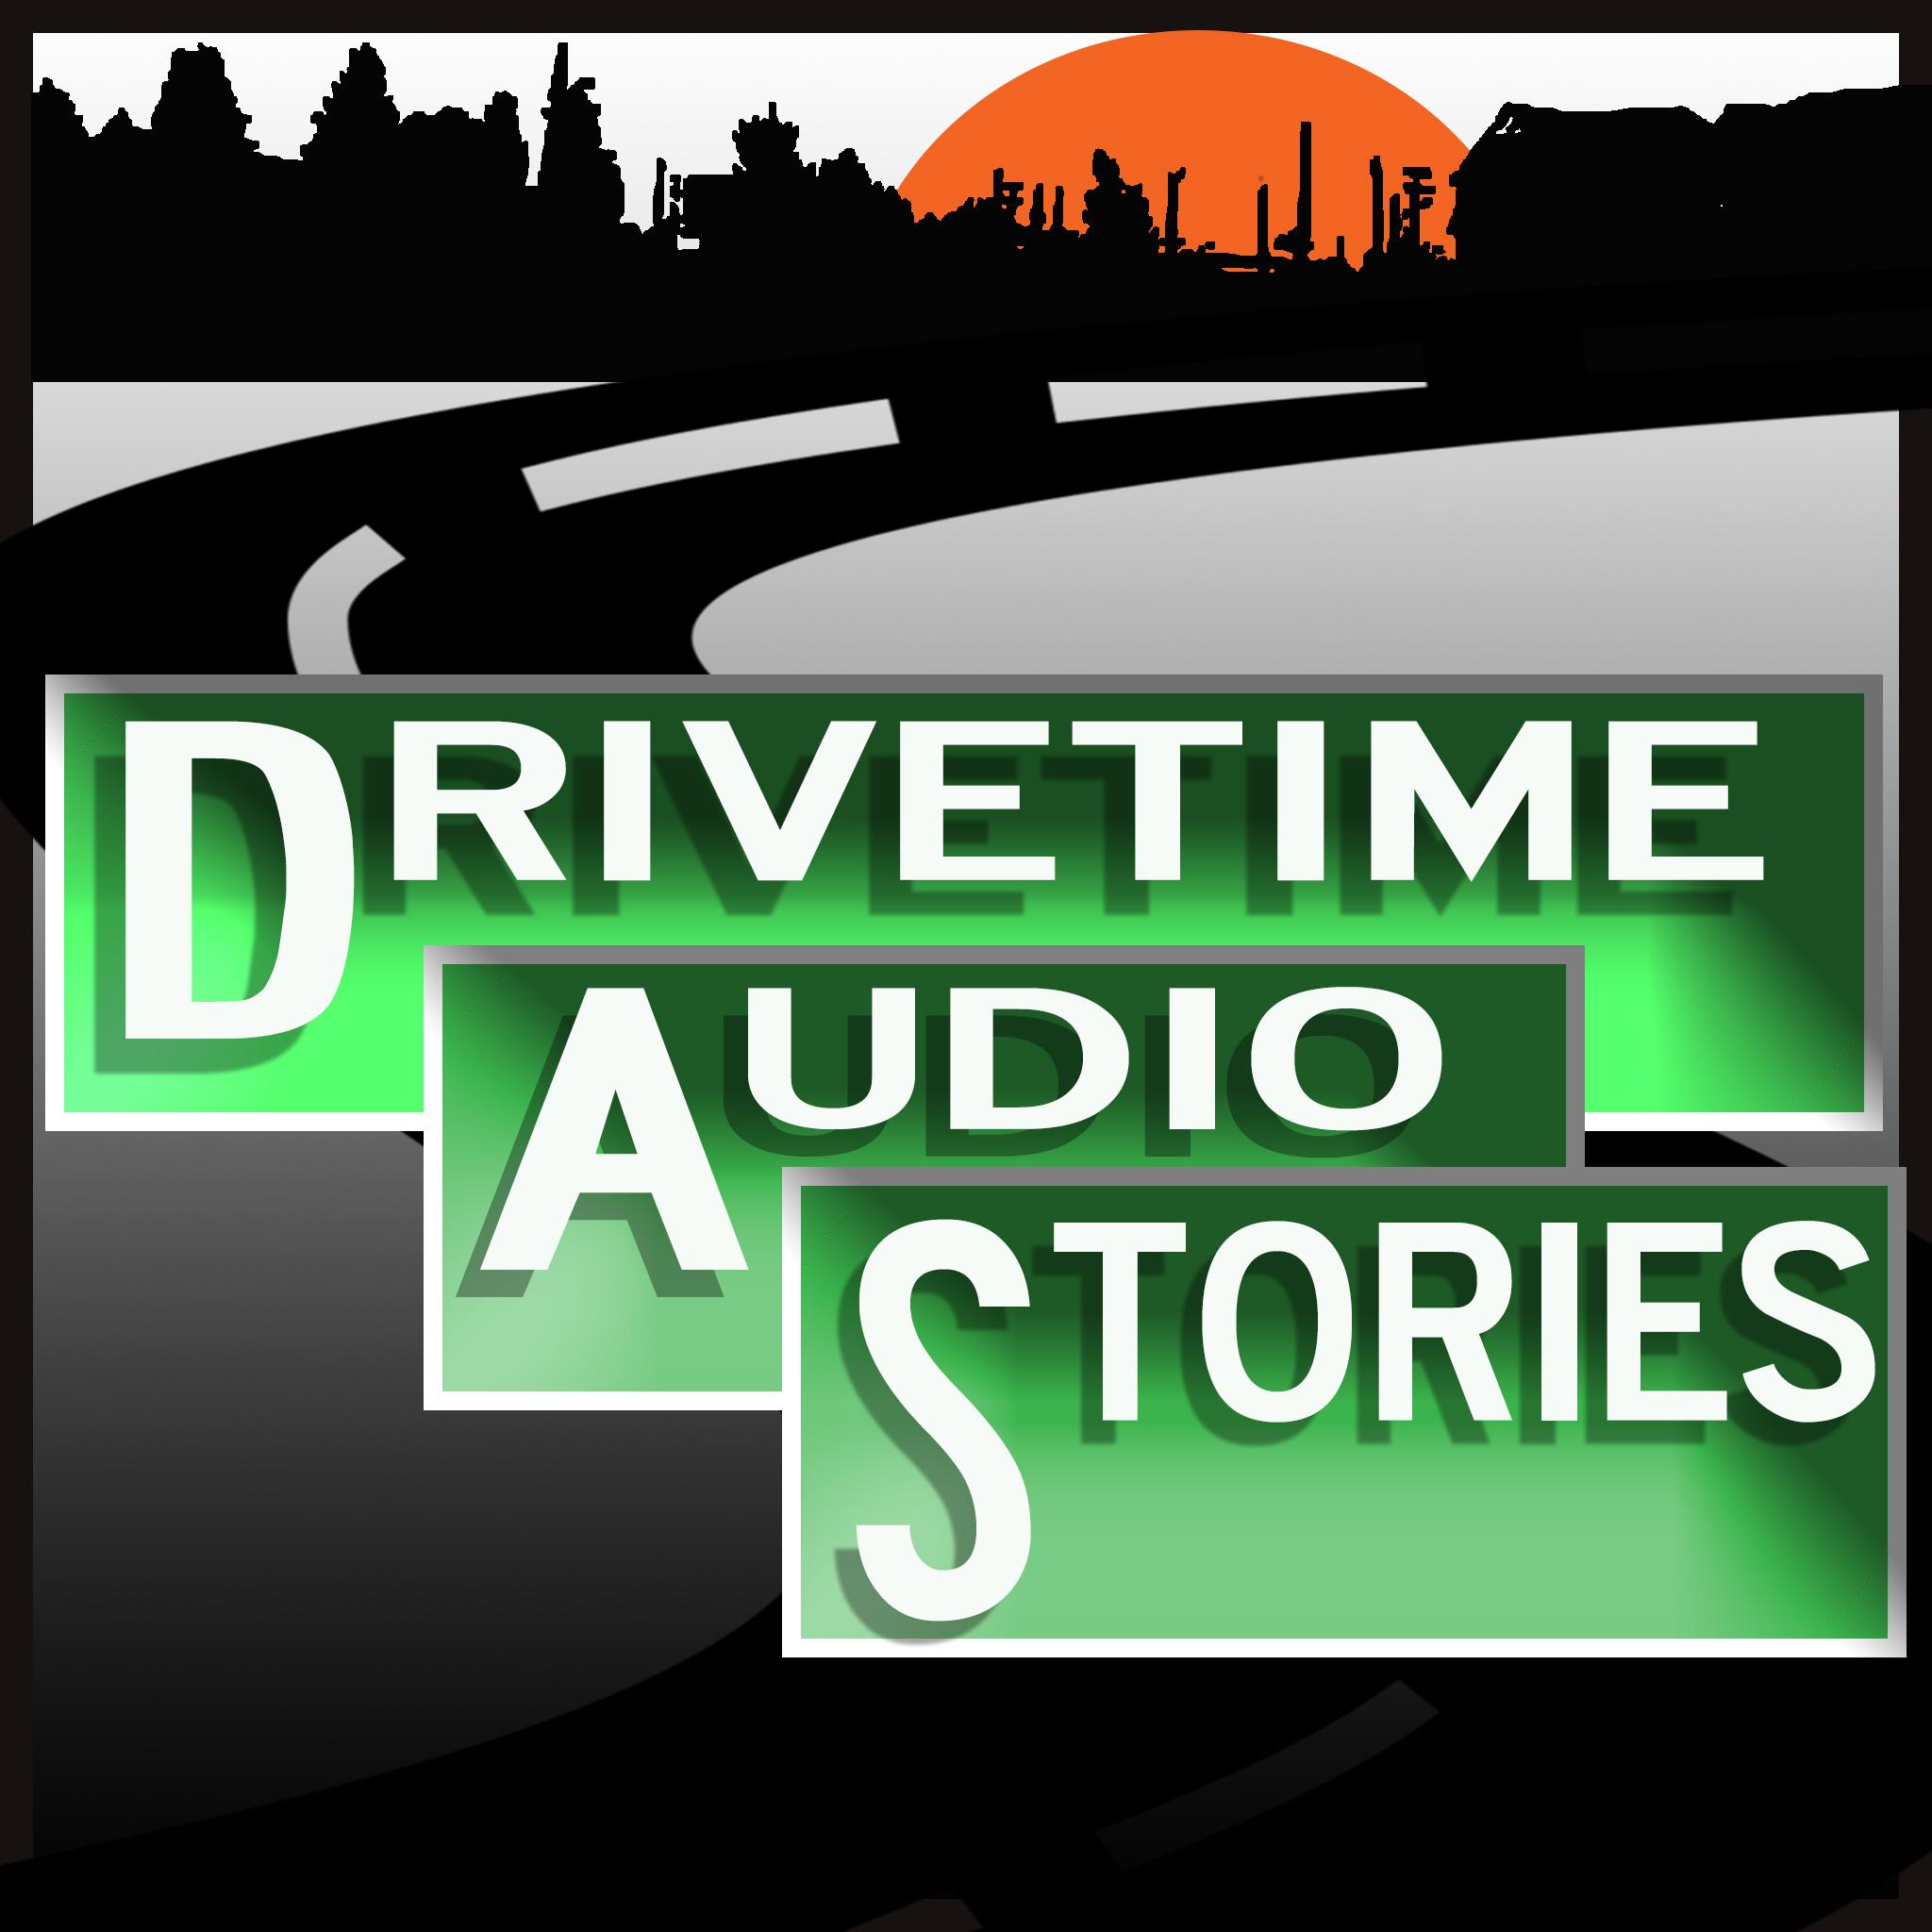 DRIVETIME AUDIO STORIES